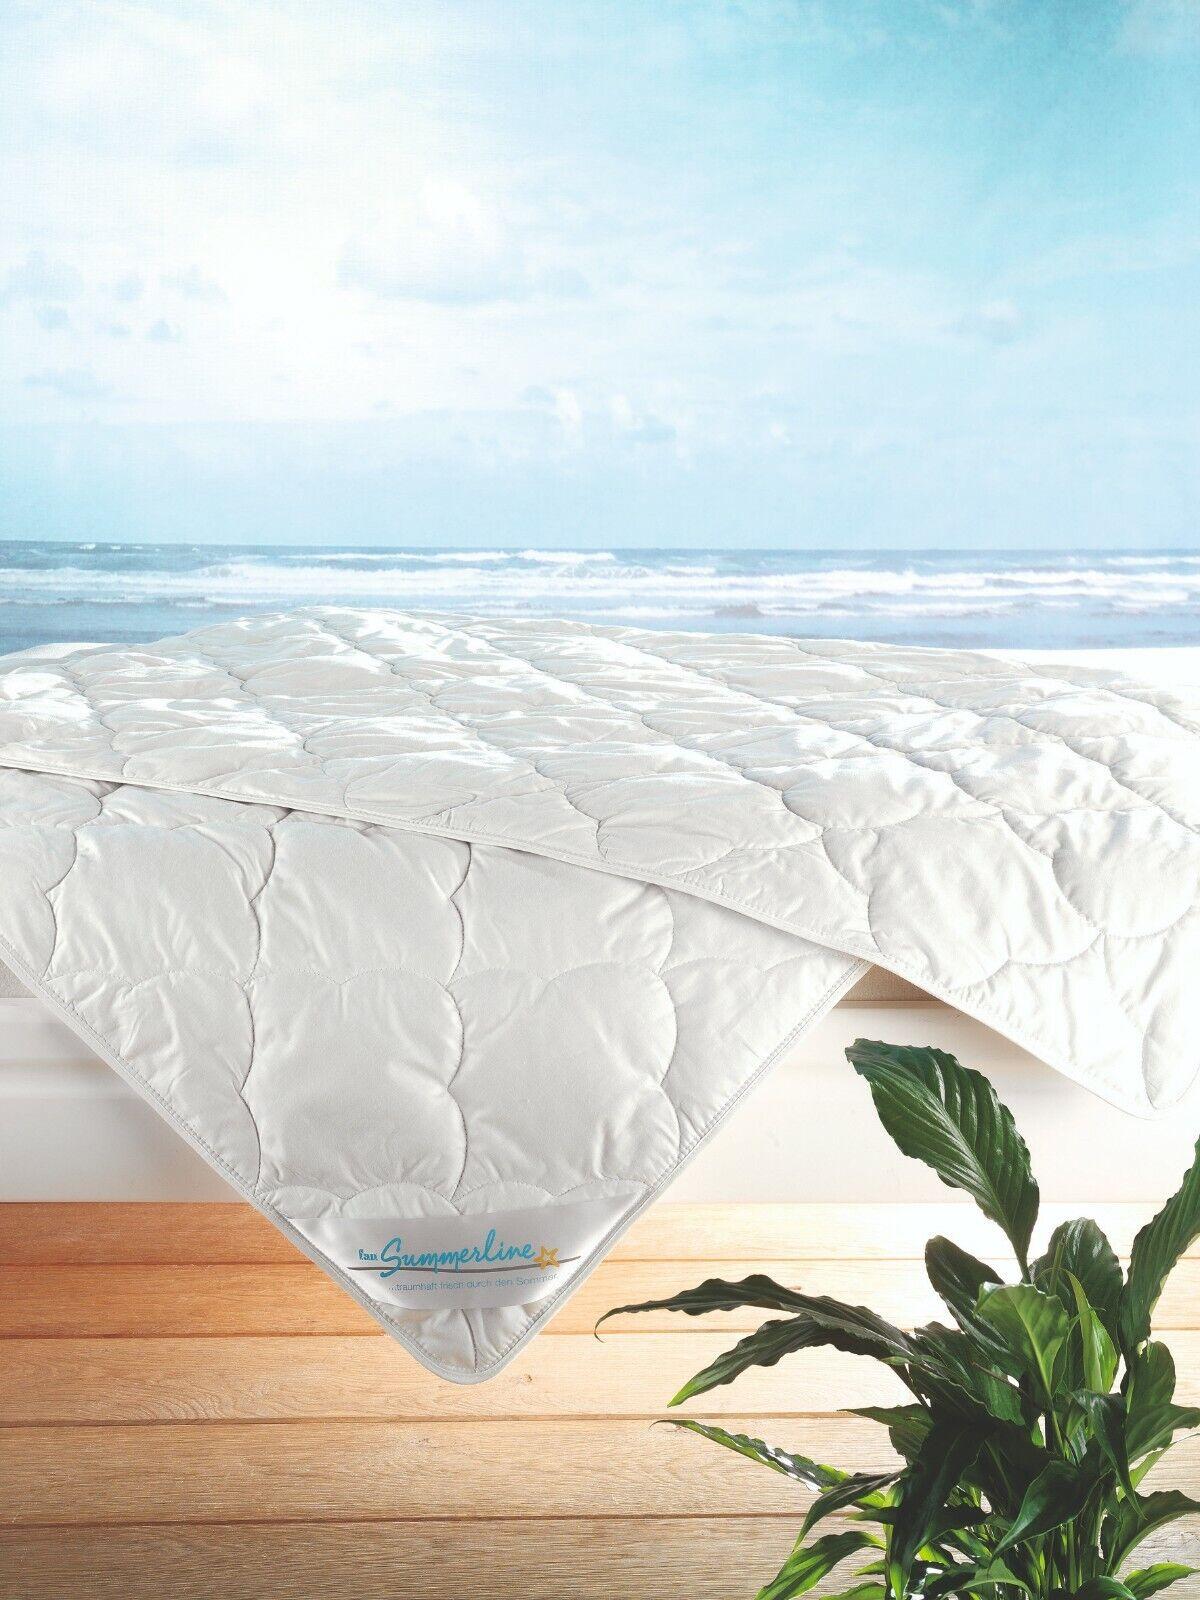 F.A.N Summerline kühle Sommerbettdecke 155x220cm Leinen Wildseide 100% Baumwolle